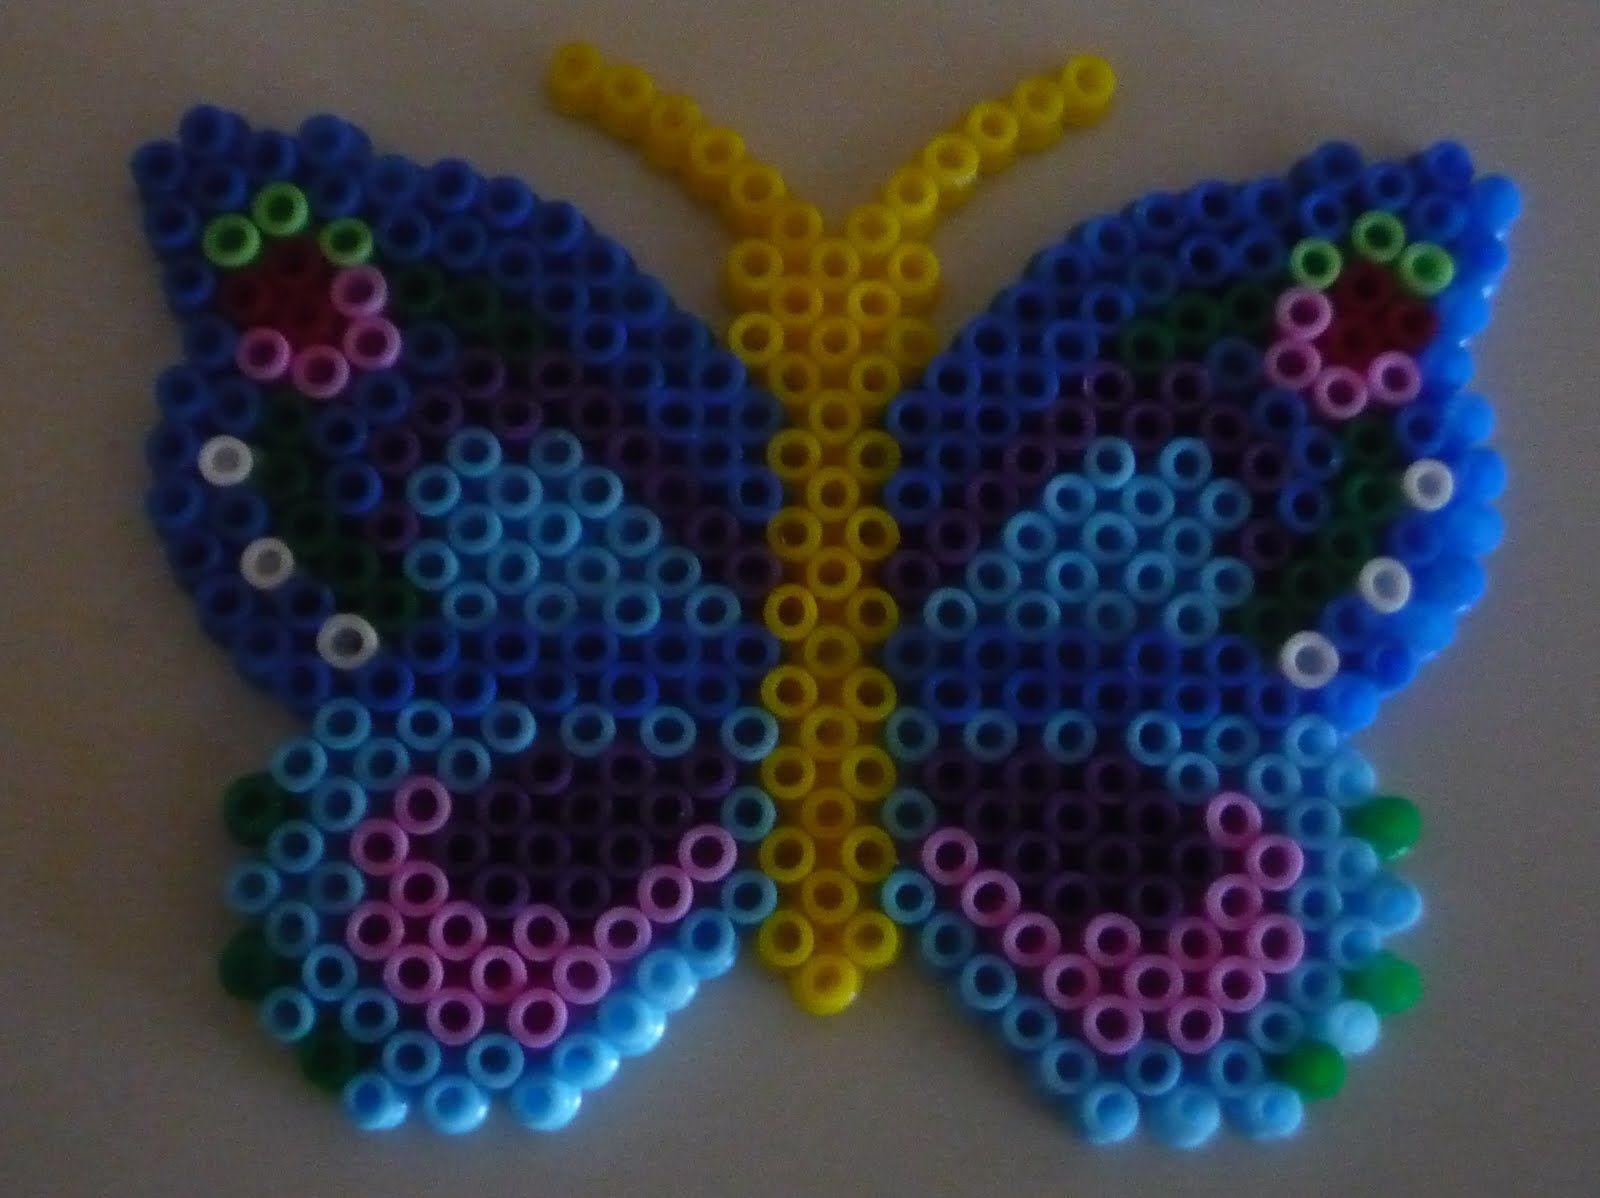 Butterfly hama beads - EnfieltrArte y otras artesManías